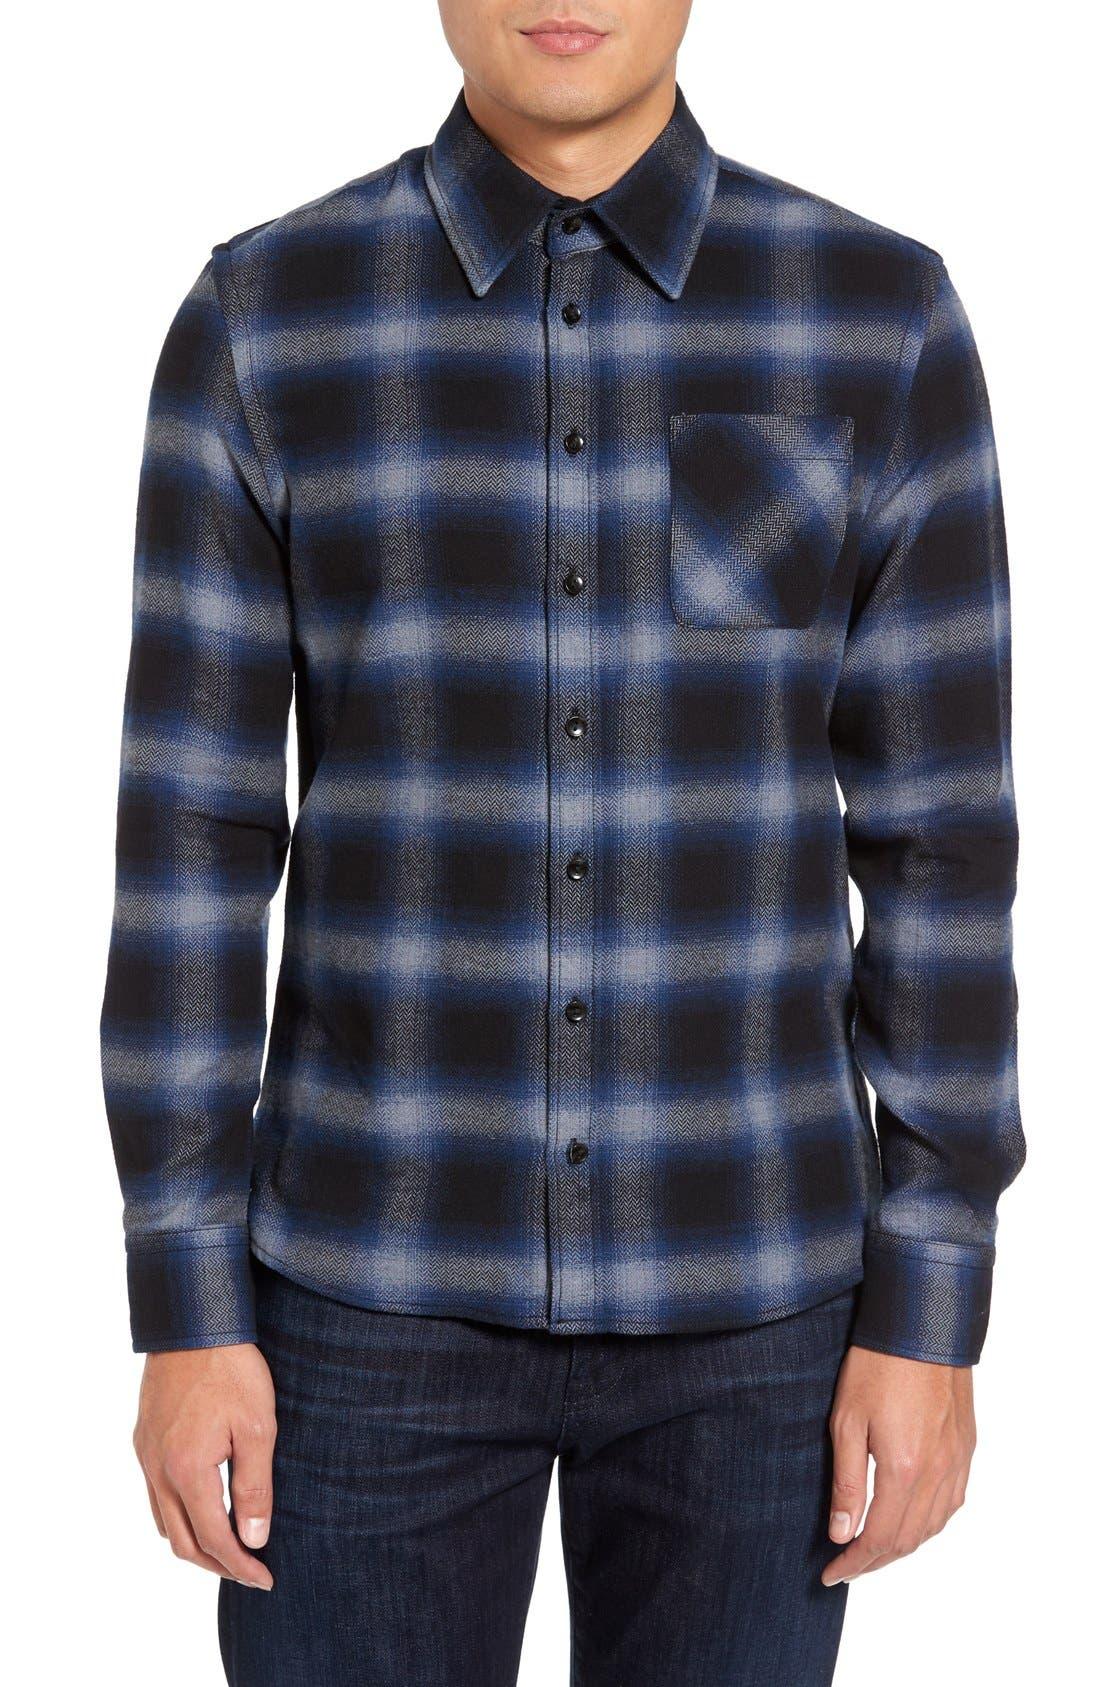 Main Image - Slate & Stone Michael Slim Fit Plaid Flannel Shirt